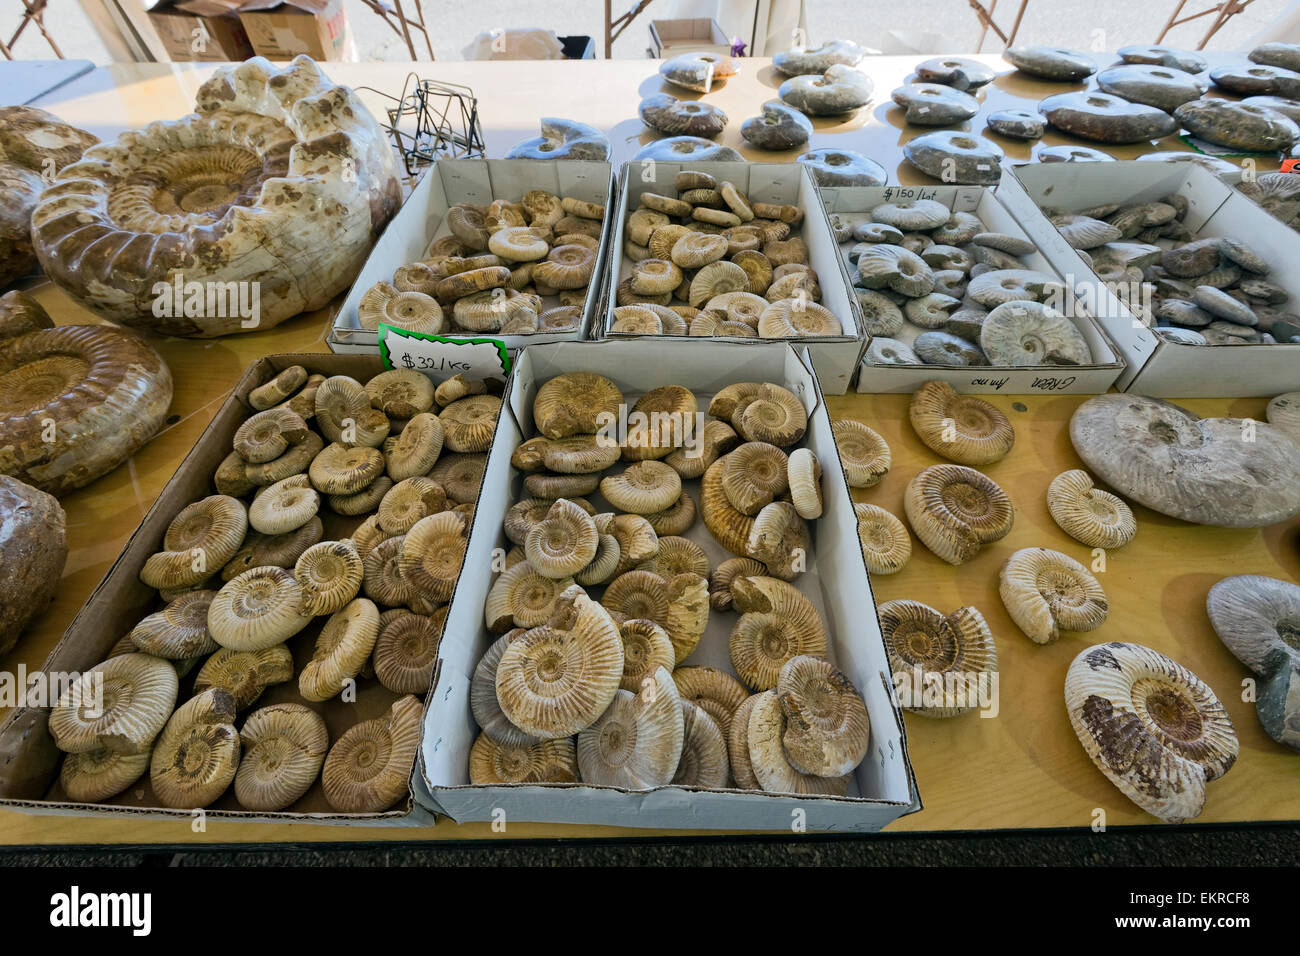 Pour la vente, fossiles d'ammonites Tucson Gem and Mineral Show, Tucson, Arizona Photo Stock